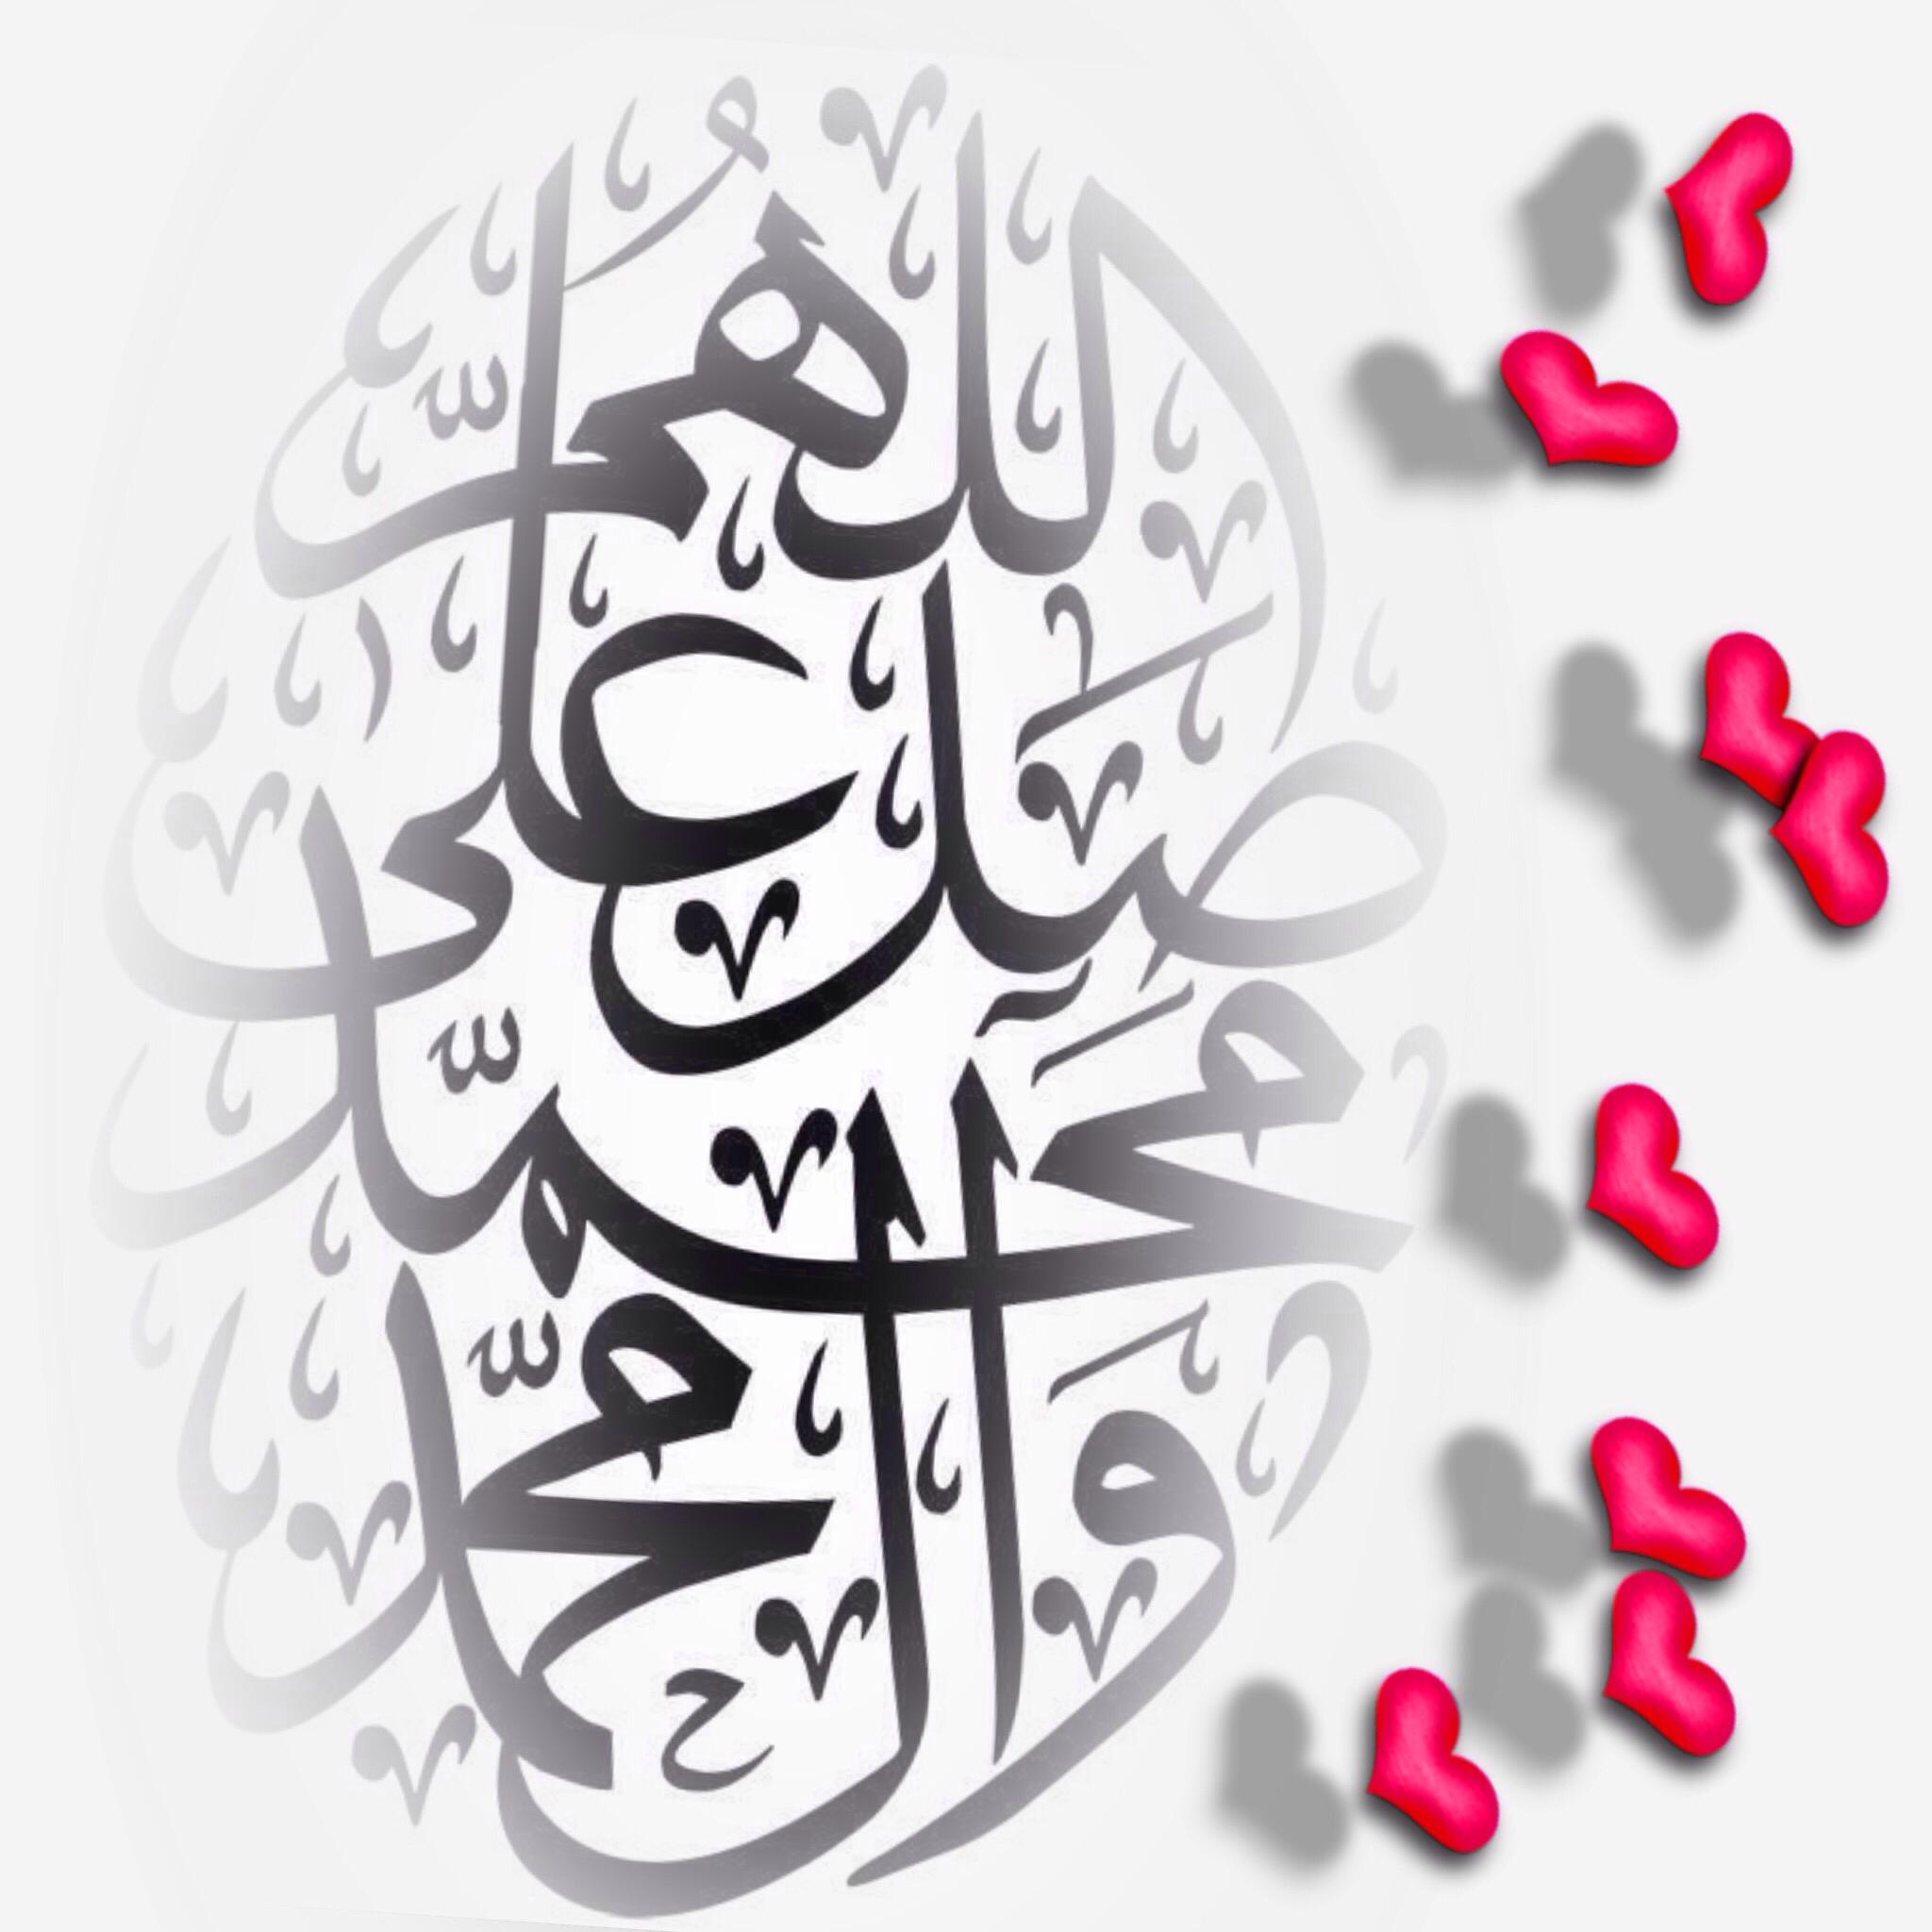 Pin By زهرة علي On اللهم صل على محمد وآل محمد٢ 10 Things Art Arabic Calligraphy